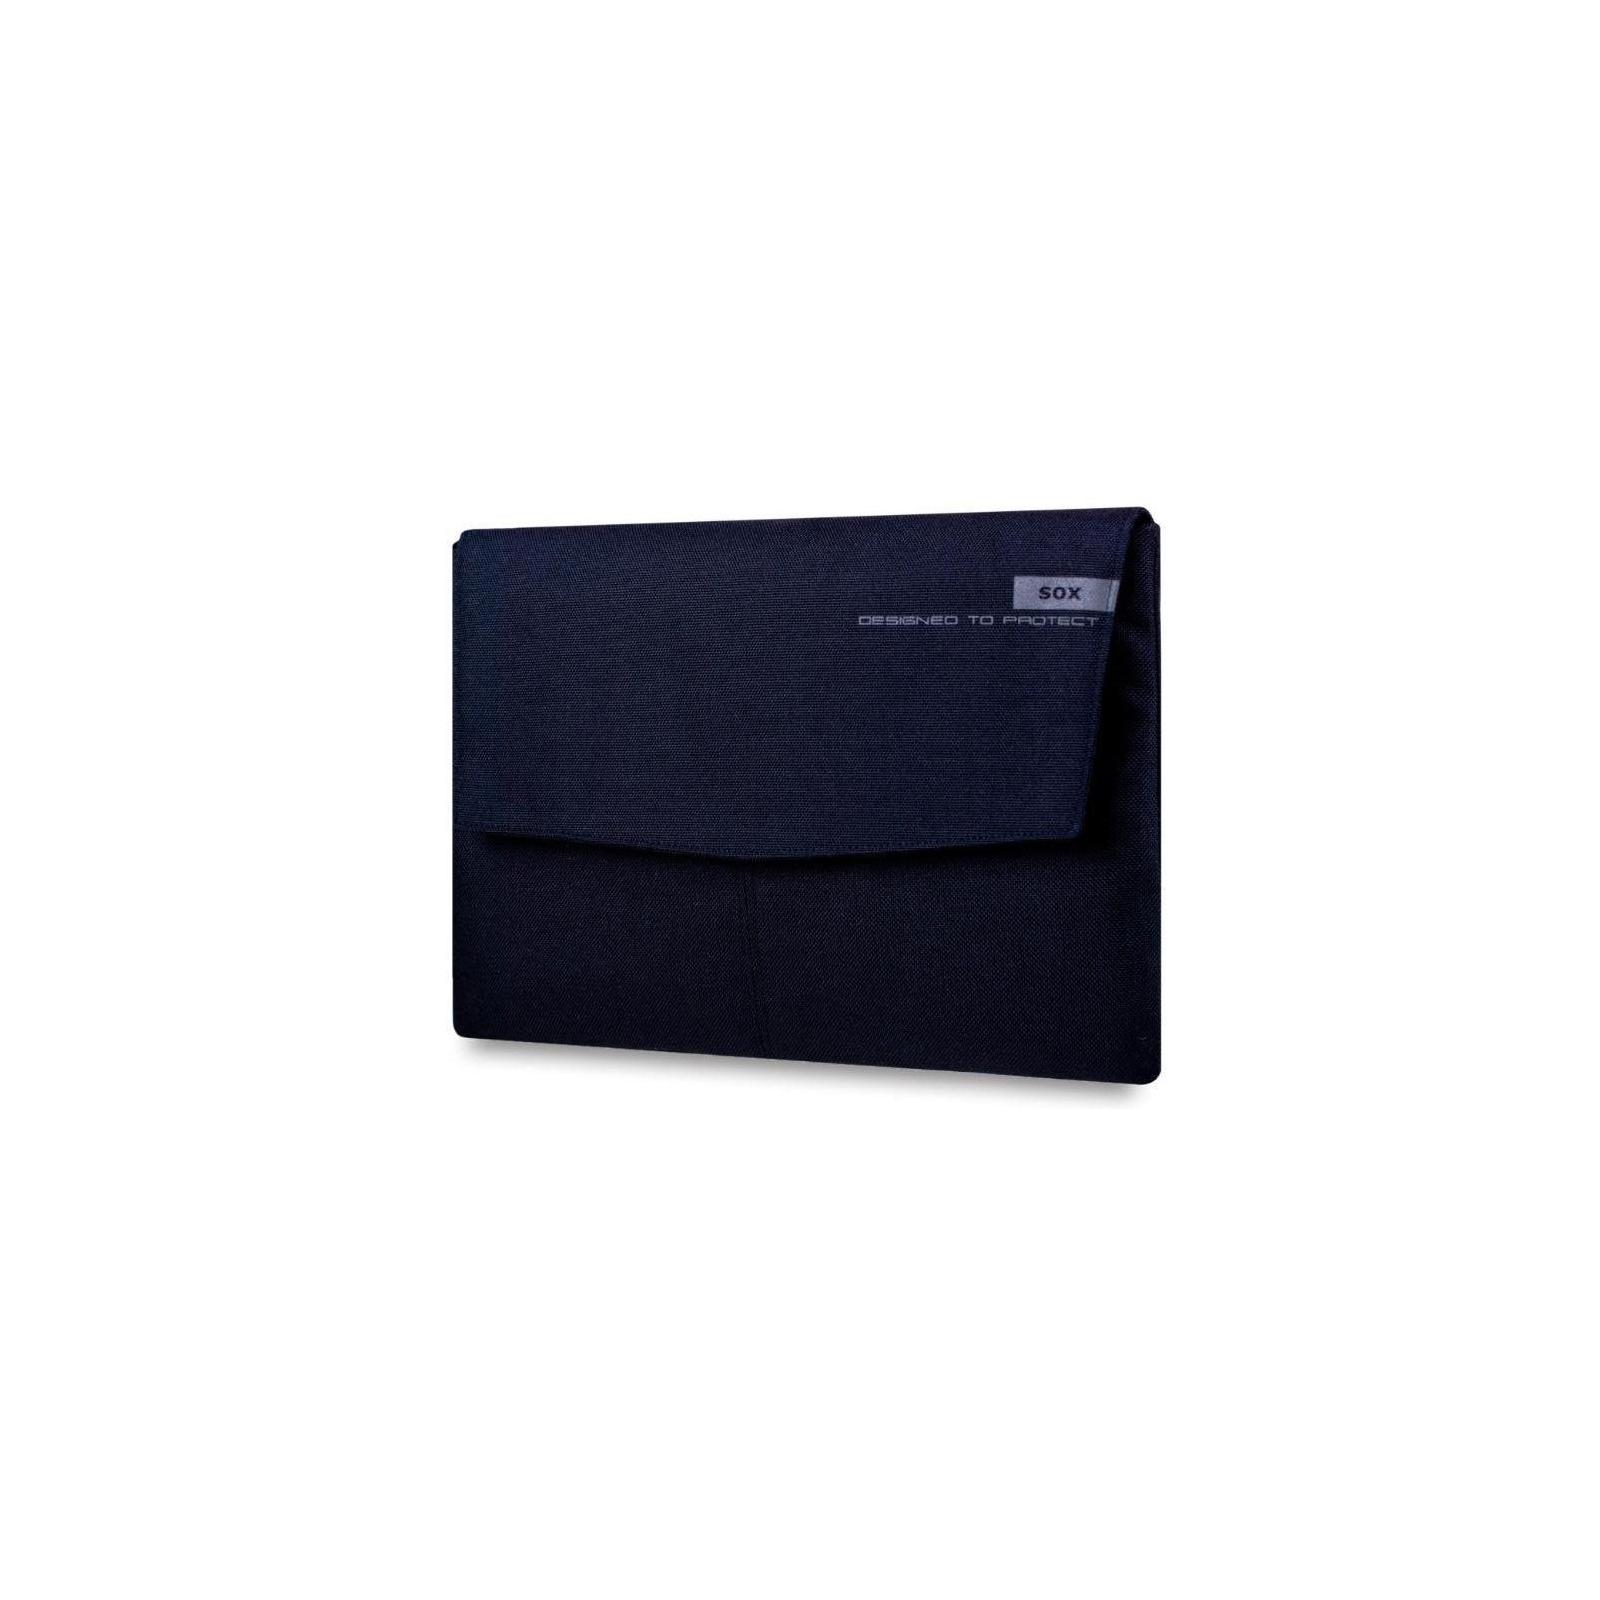 Чехол для планшета SLE NB1 GX10 Sox